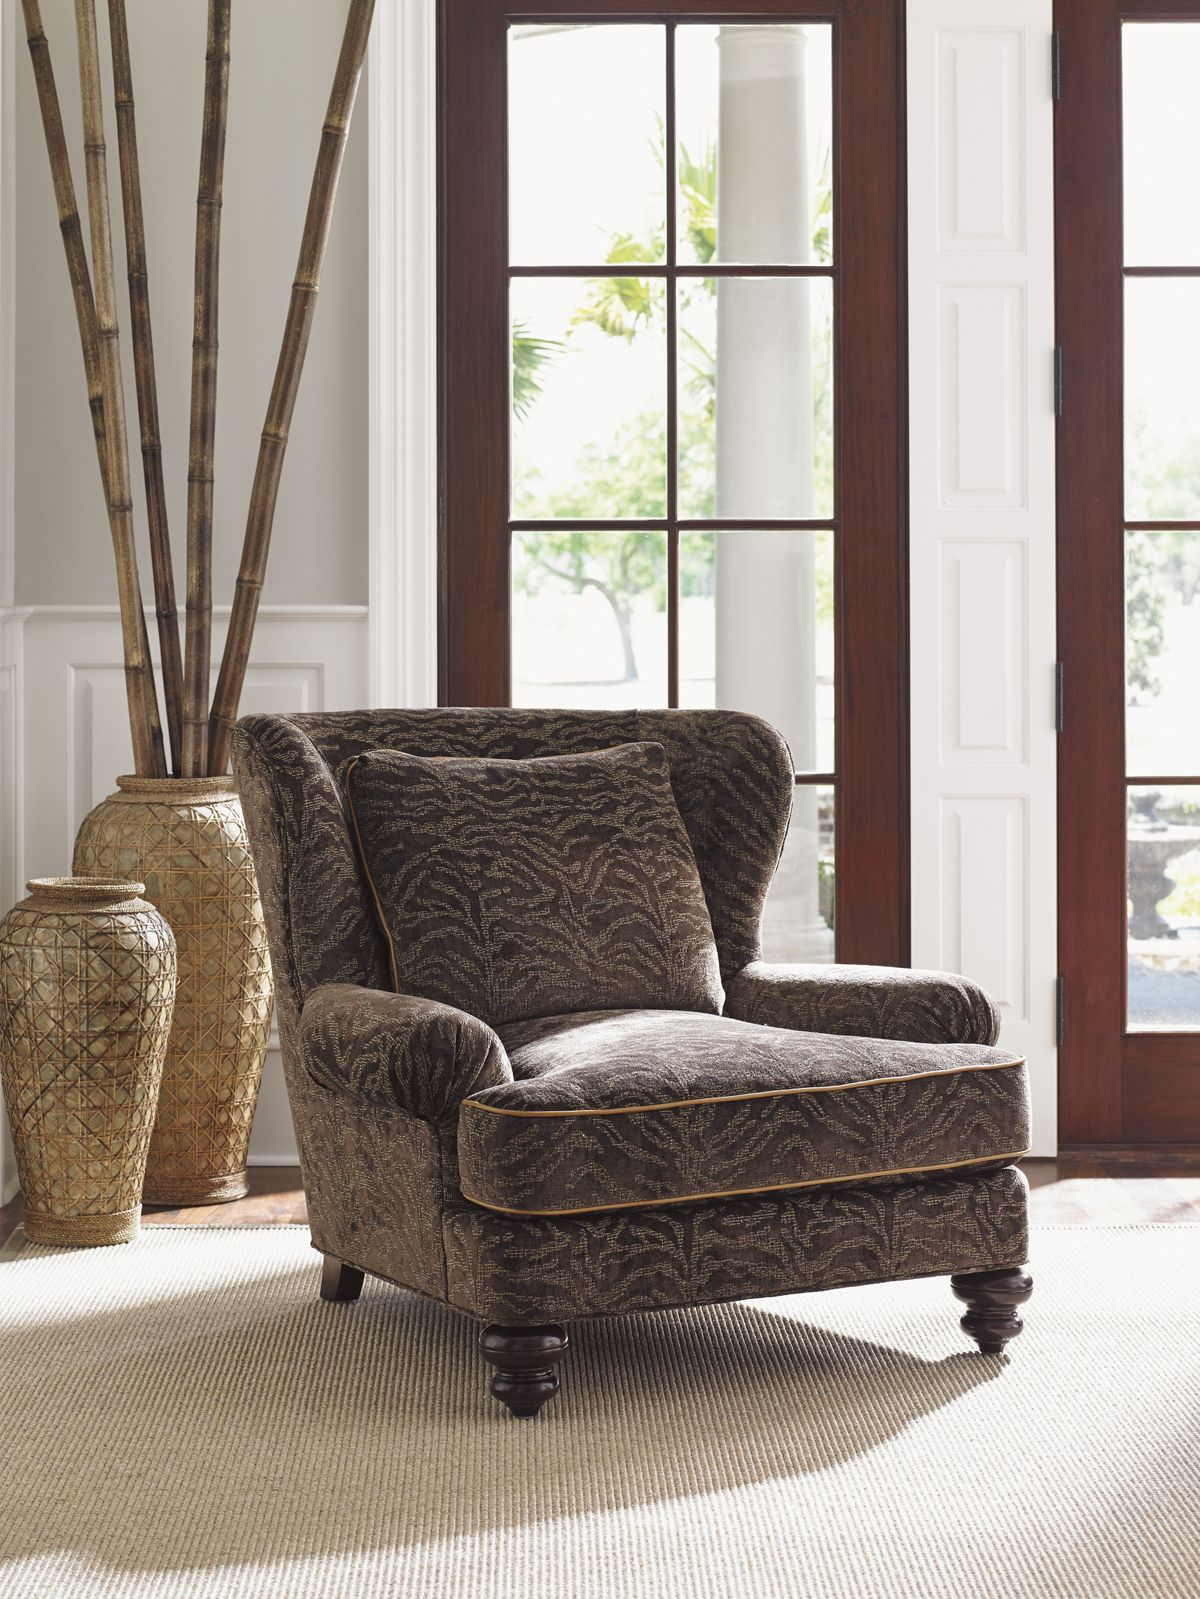 Kilimanjaro Kent Chair Lexington Home Brands Leather